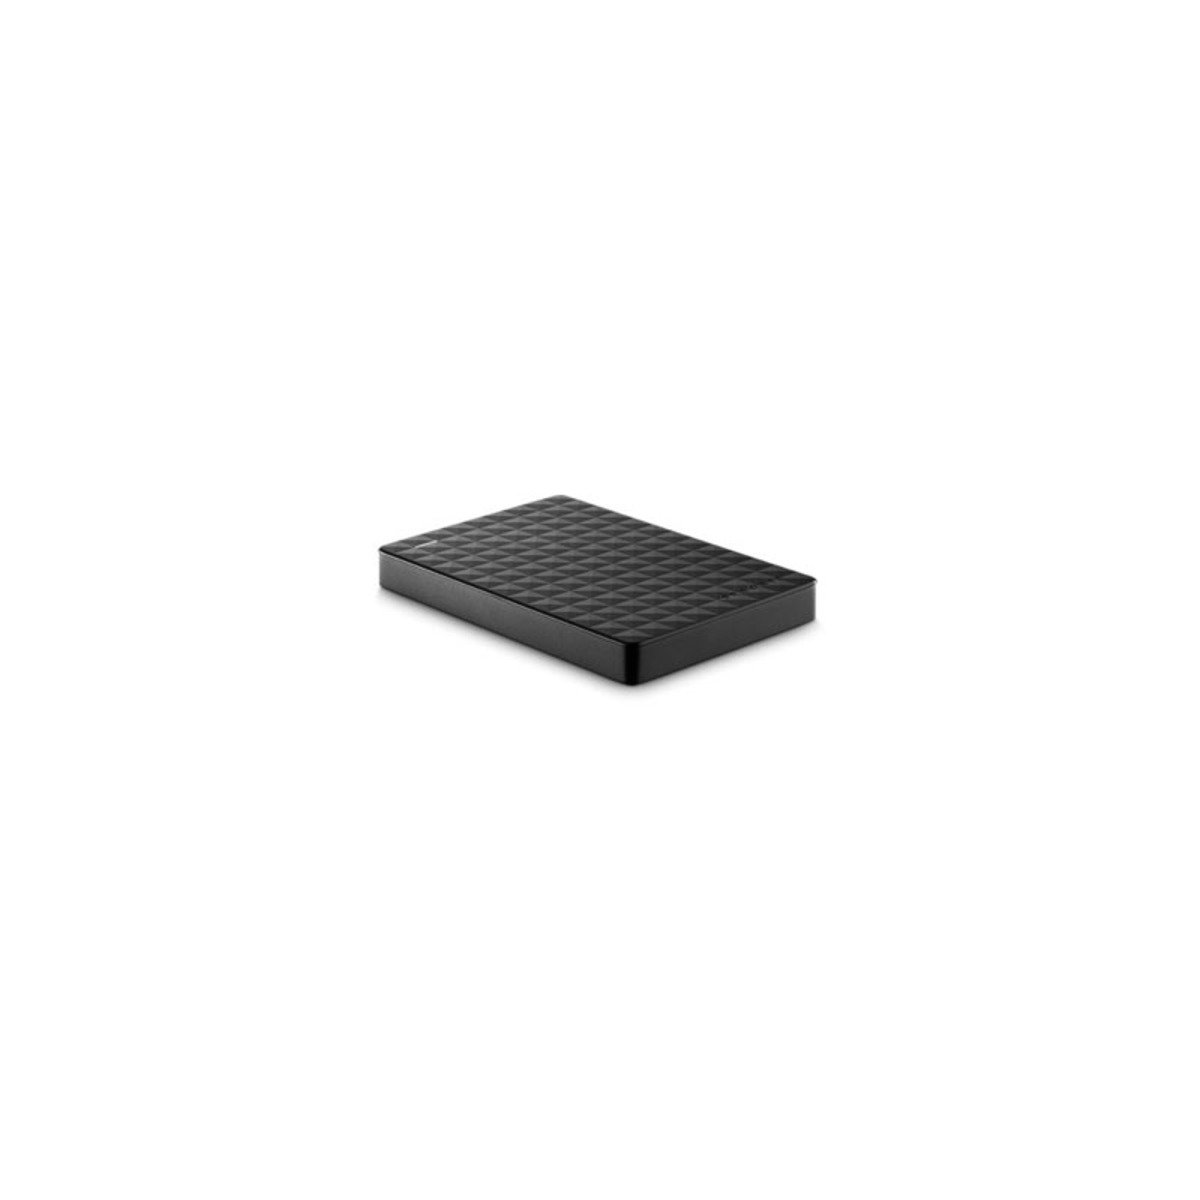 Expansion 2TB USB 3.0 2.5吋 外置硬碟 STEA2000400